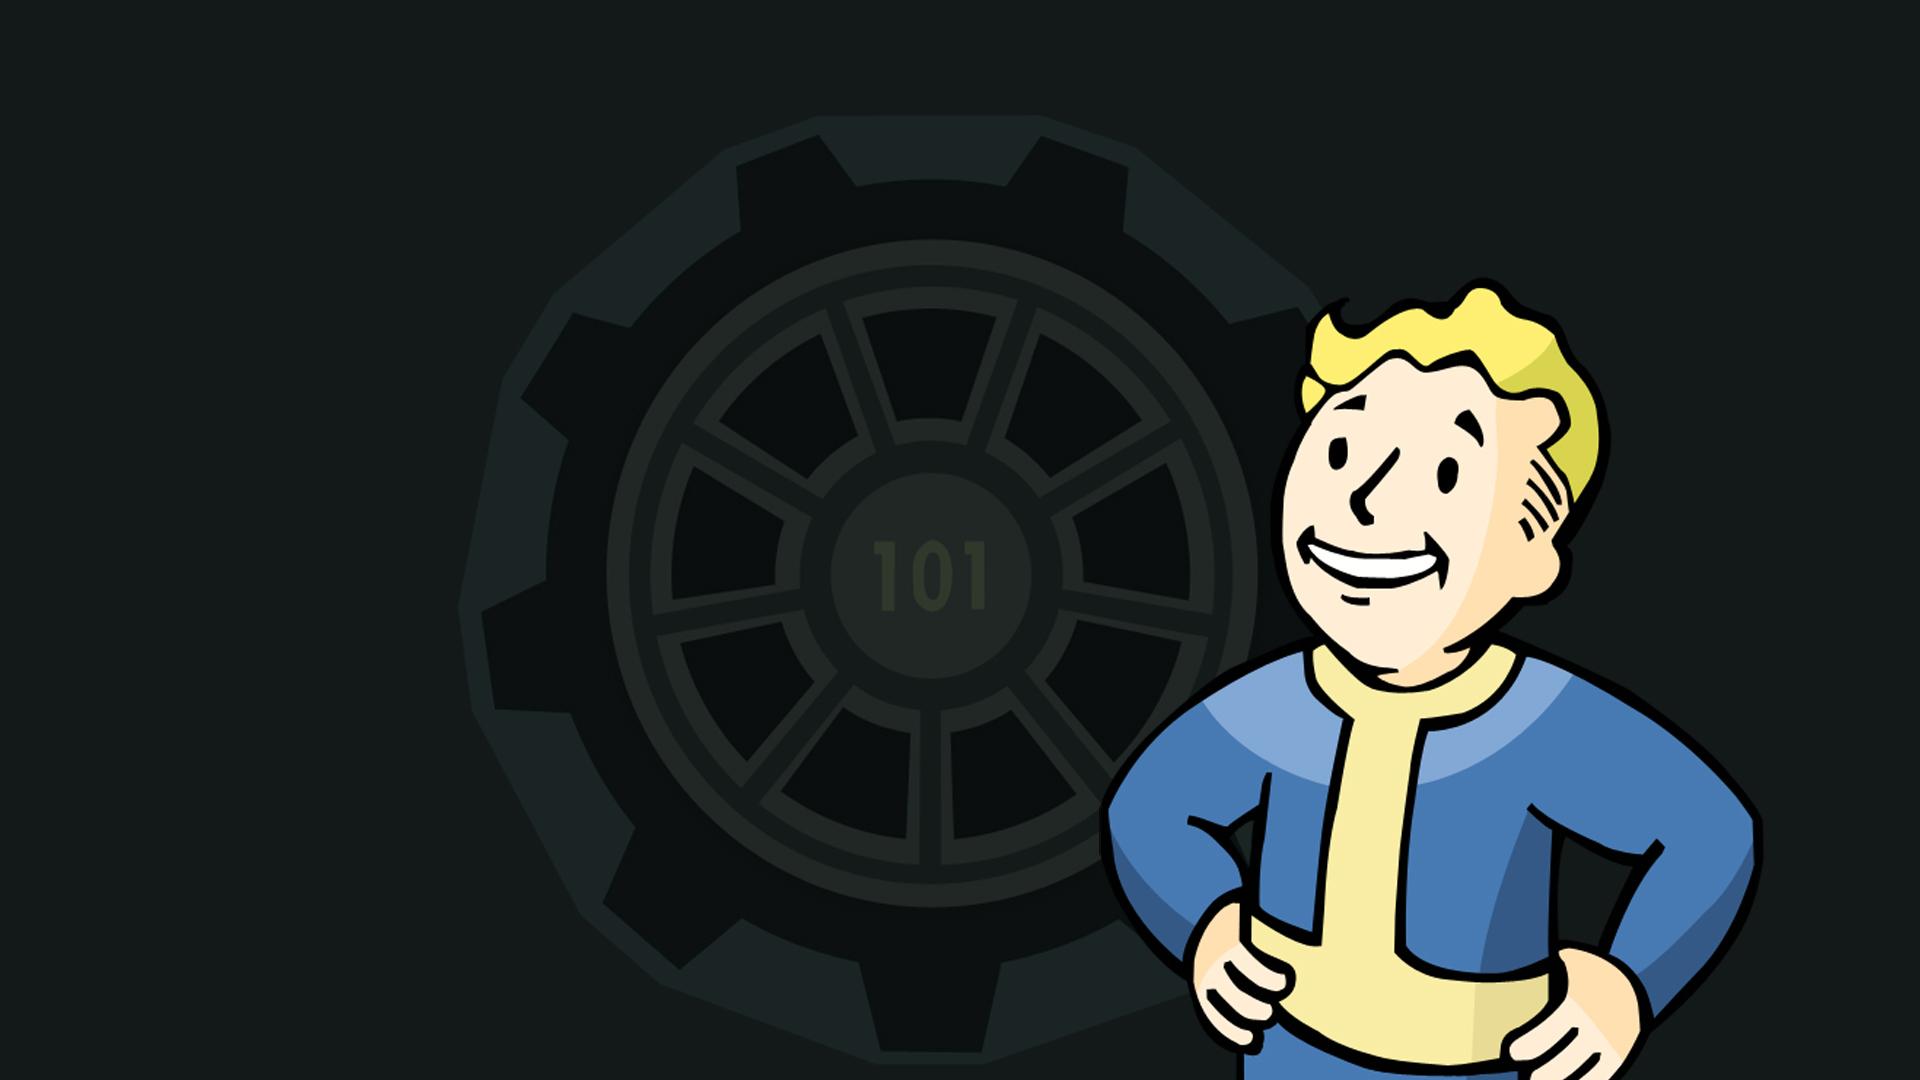 Fallout Computer Wallpapers Desktop Backgrounds 1920x1080 ID 1920x1080